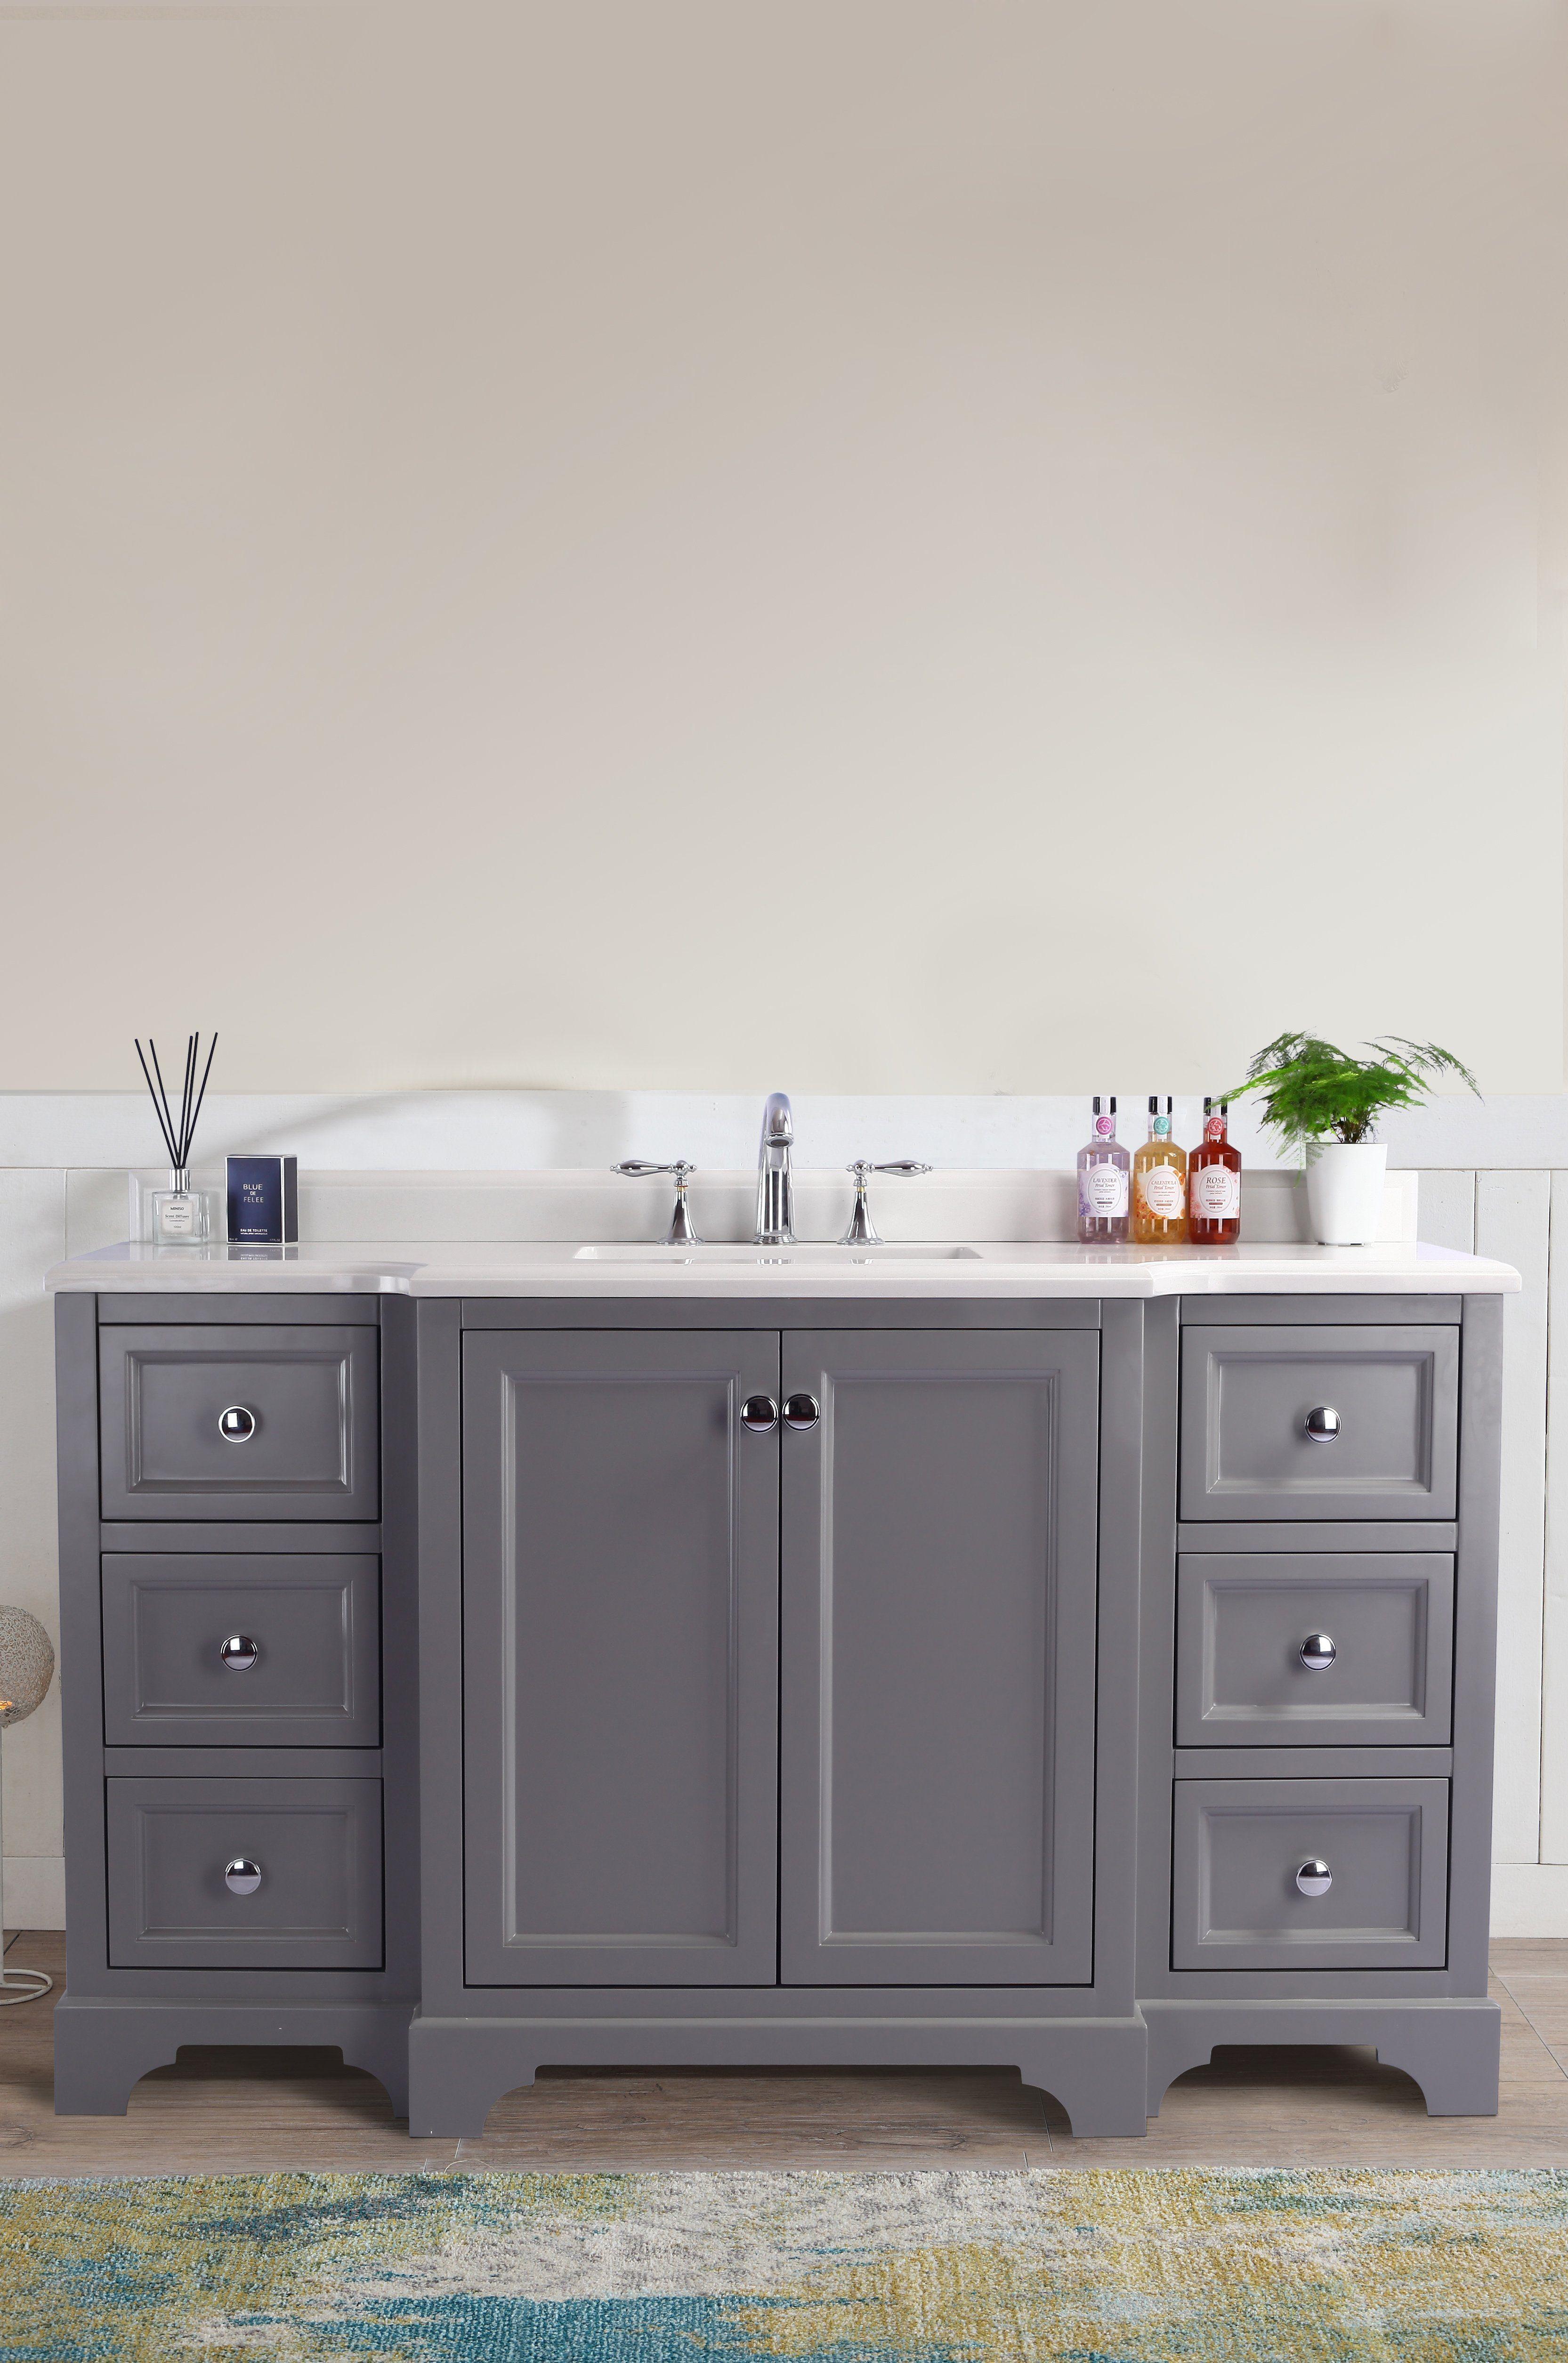 65 most popular small bathroom remodel ideas on a budget in 2018 rh pinterest com